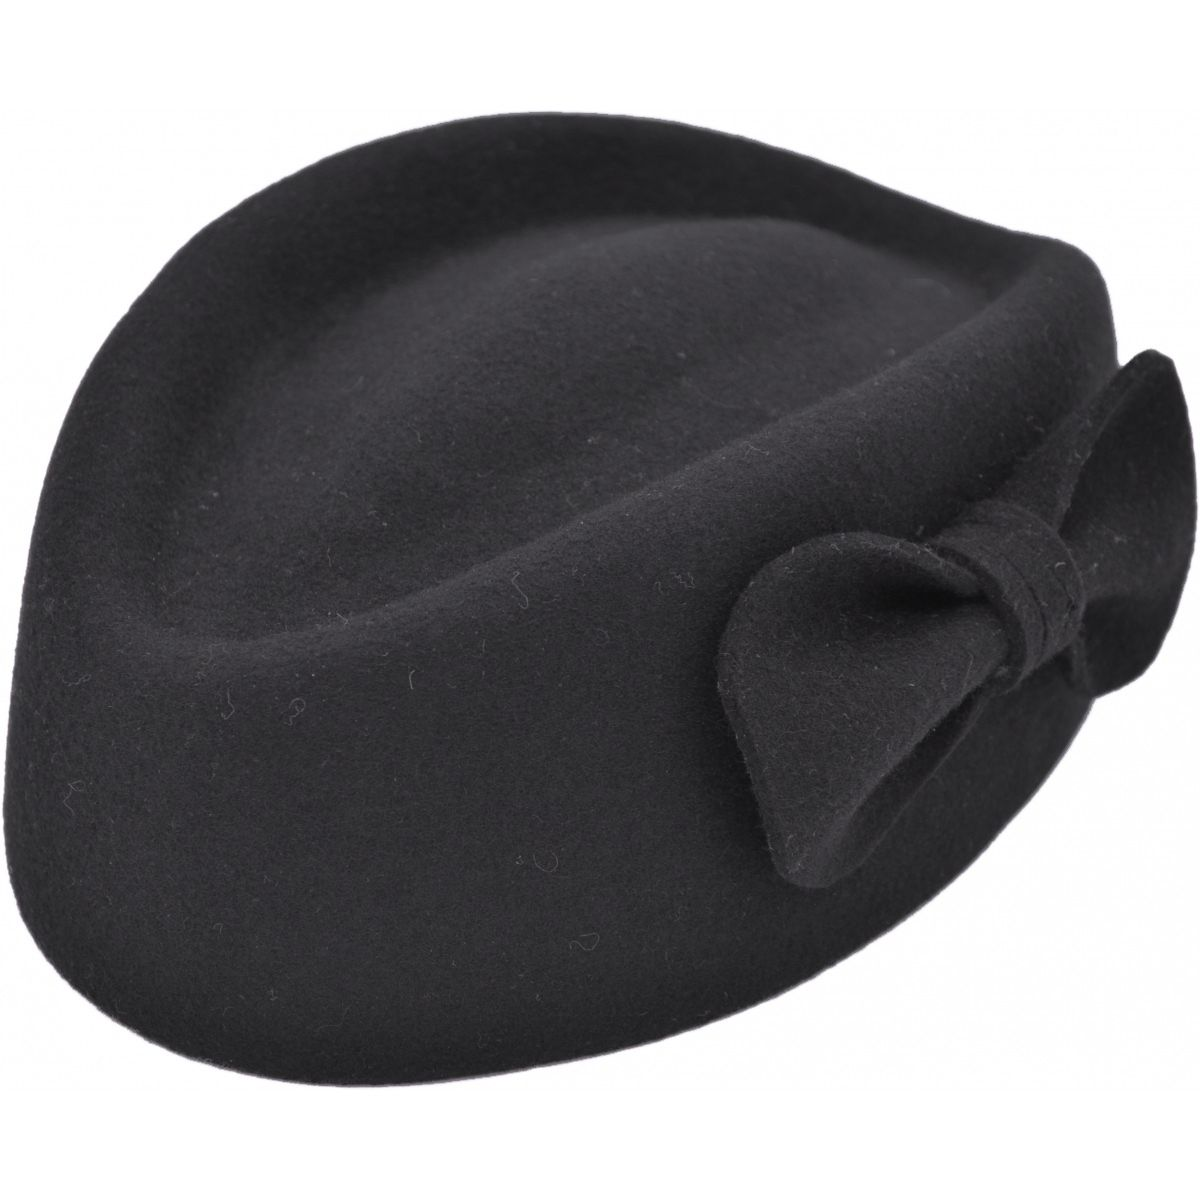 eae2762b_chapeau-retro-pin-up-40-s-50-s-glam-chic-clara-noir